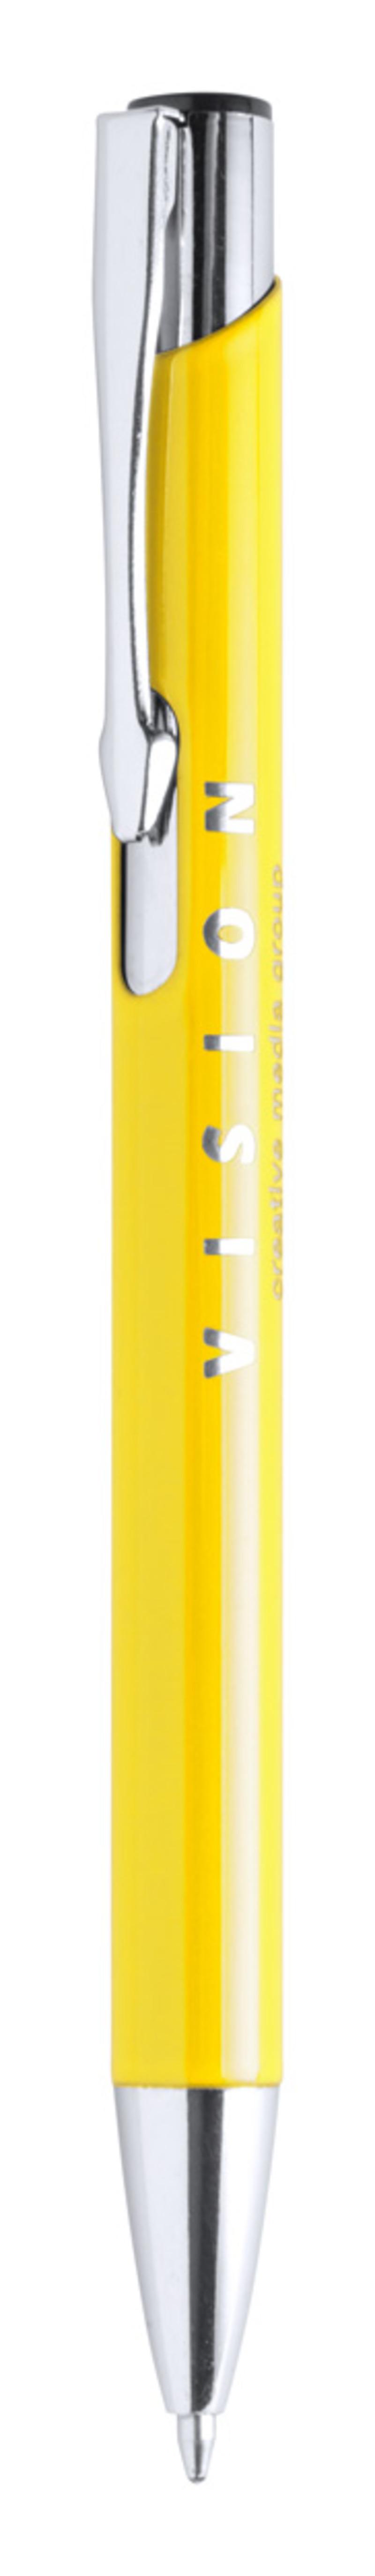 Bizol ballpoint pen